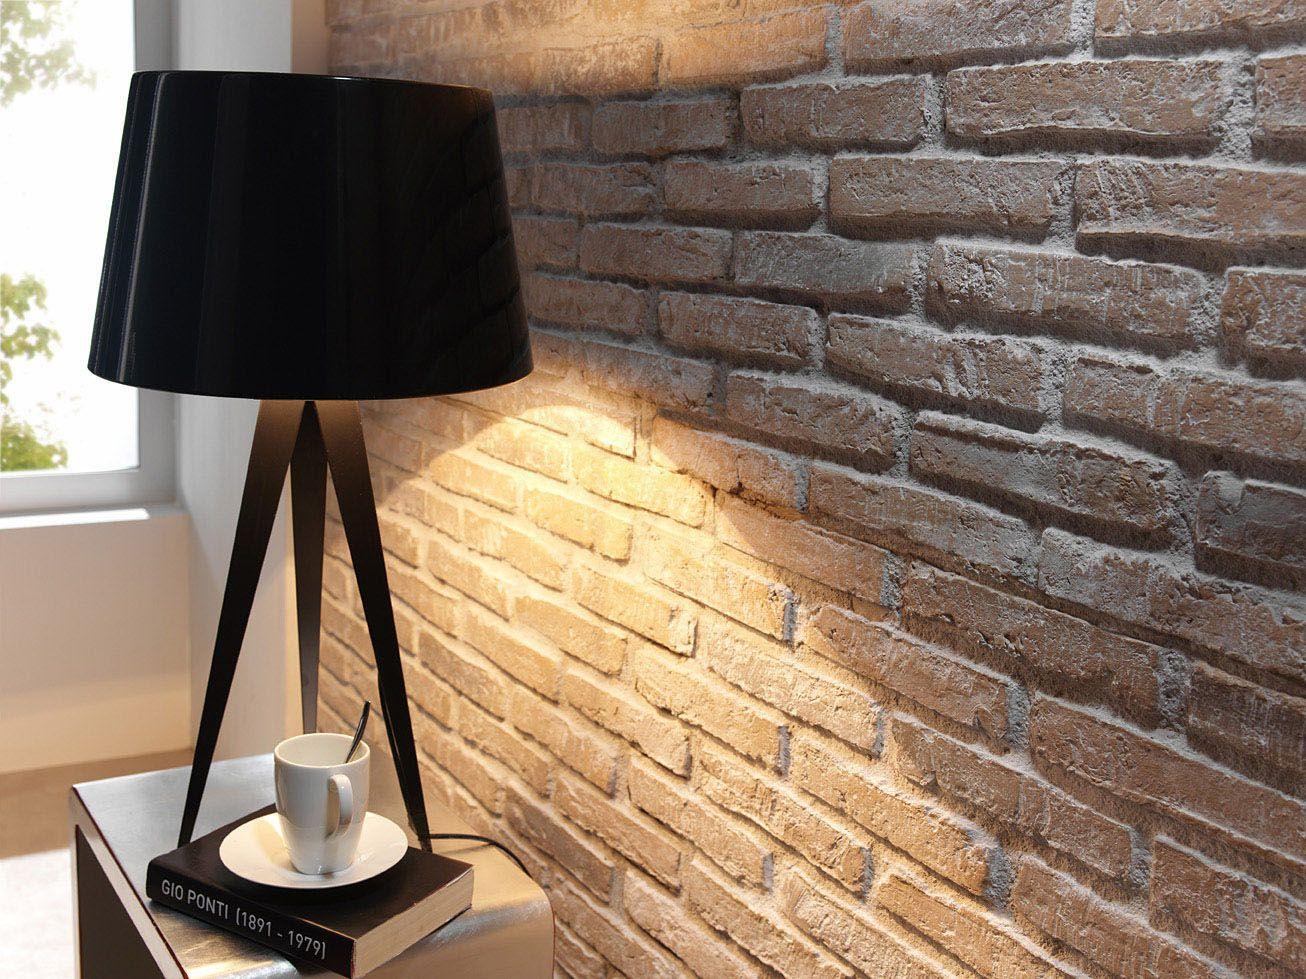 79 Ladrillo rustico terroso caleado | Living Room | Pinterest ...